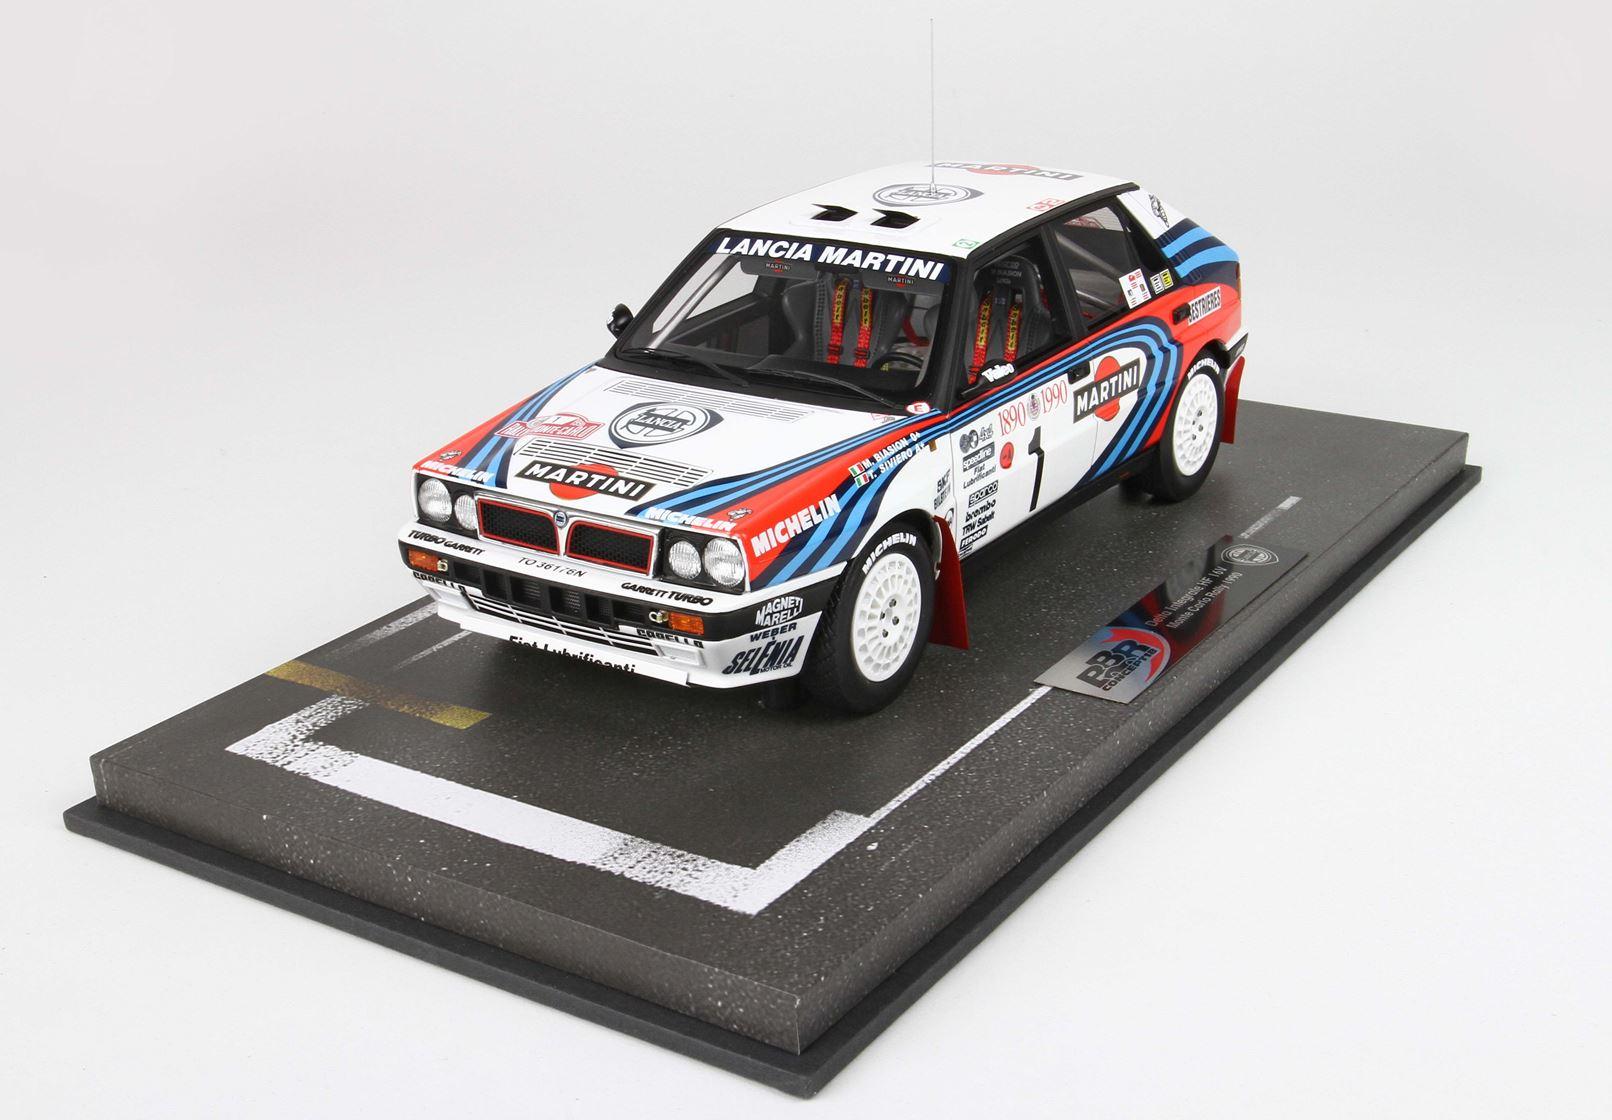 Lancia Delta Integrale HF 16V Monte Carlo Rally 1990 1/18